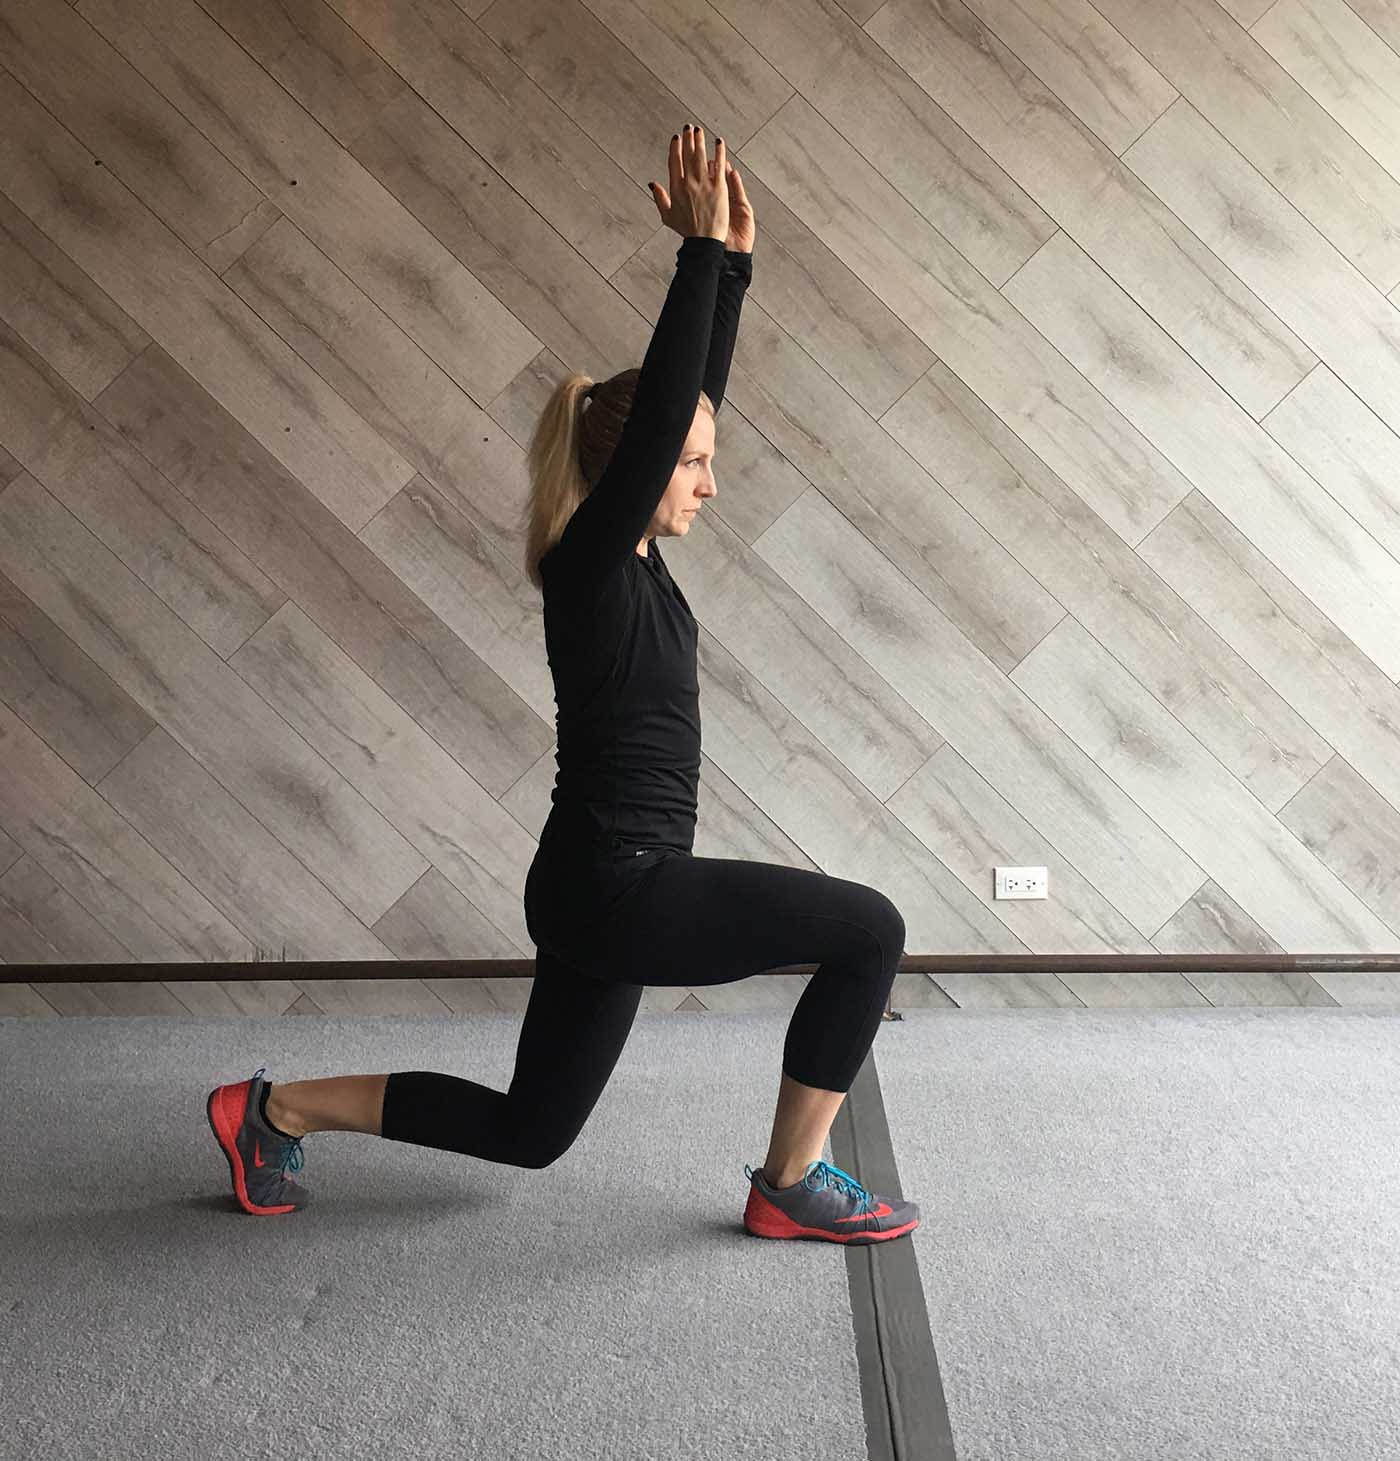 asweatlife_treadmill-challenge_overhead-lunge_1